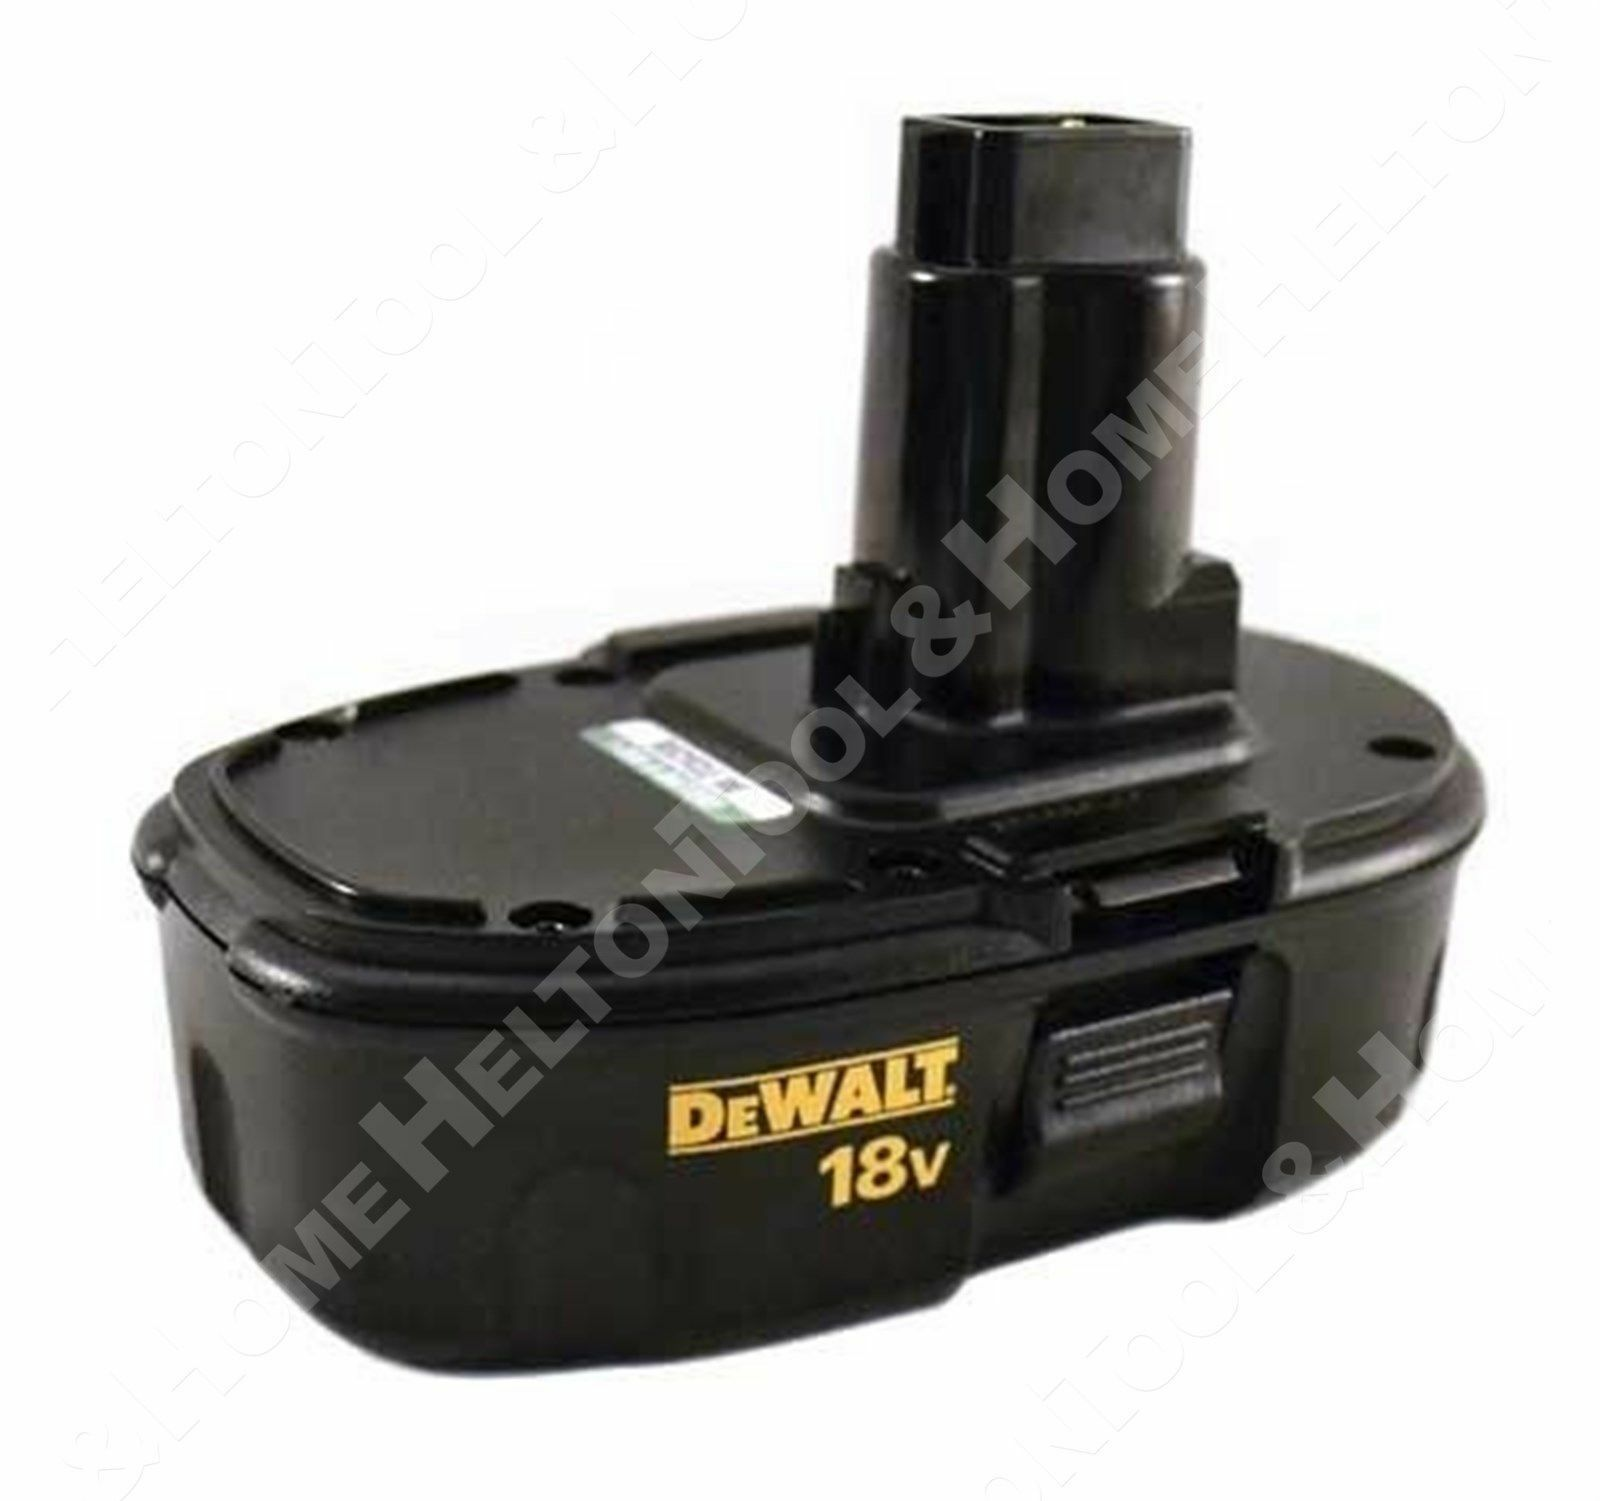 Dewalt DC9099 18V NiCd Pod Style Battery For DC825 DCF826 DC827 DC925 DCD950